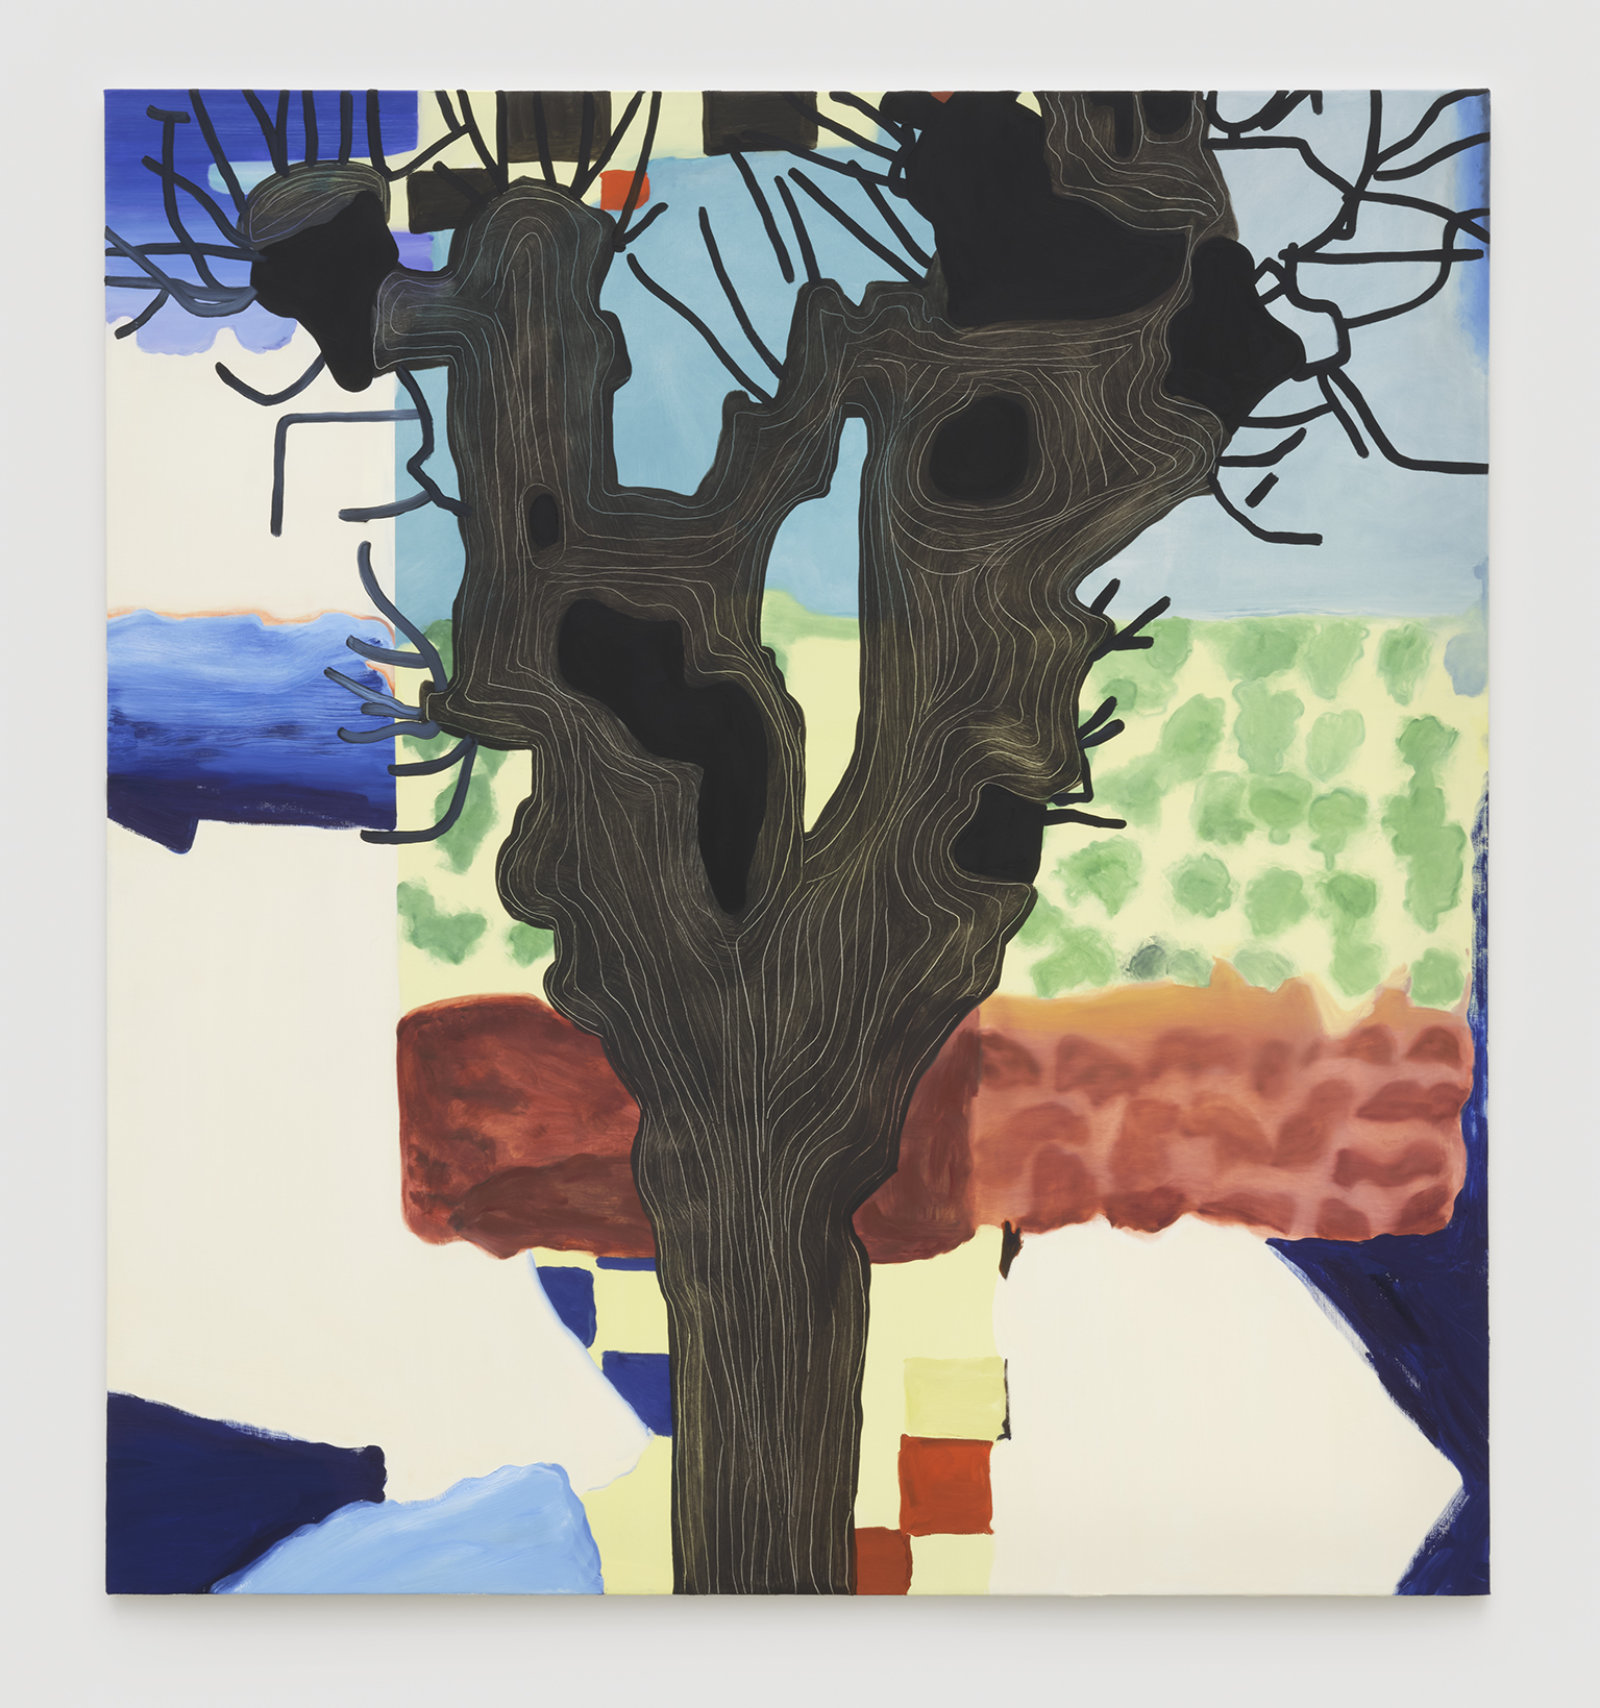 Elizabeth McIntosh, Knobby Tree, 2019, oil on canvas, 73 x 67 in. (185 x 170 cm) by Elizabeth McIntosh